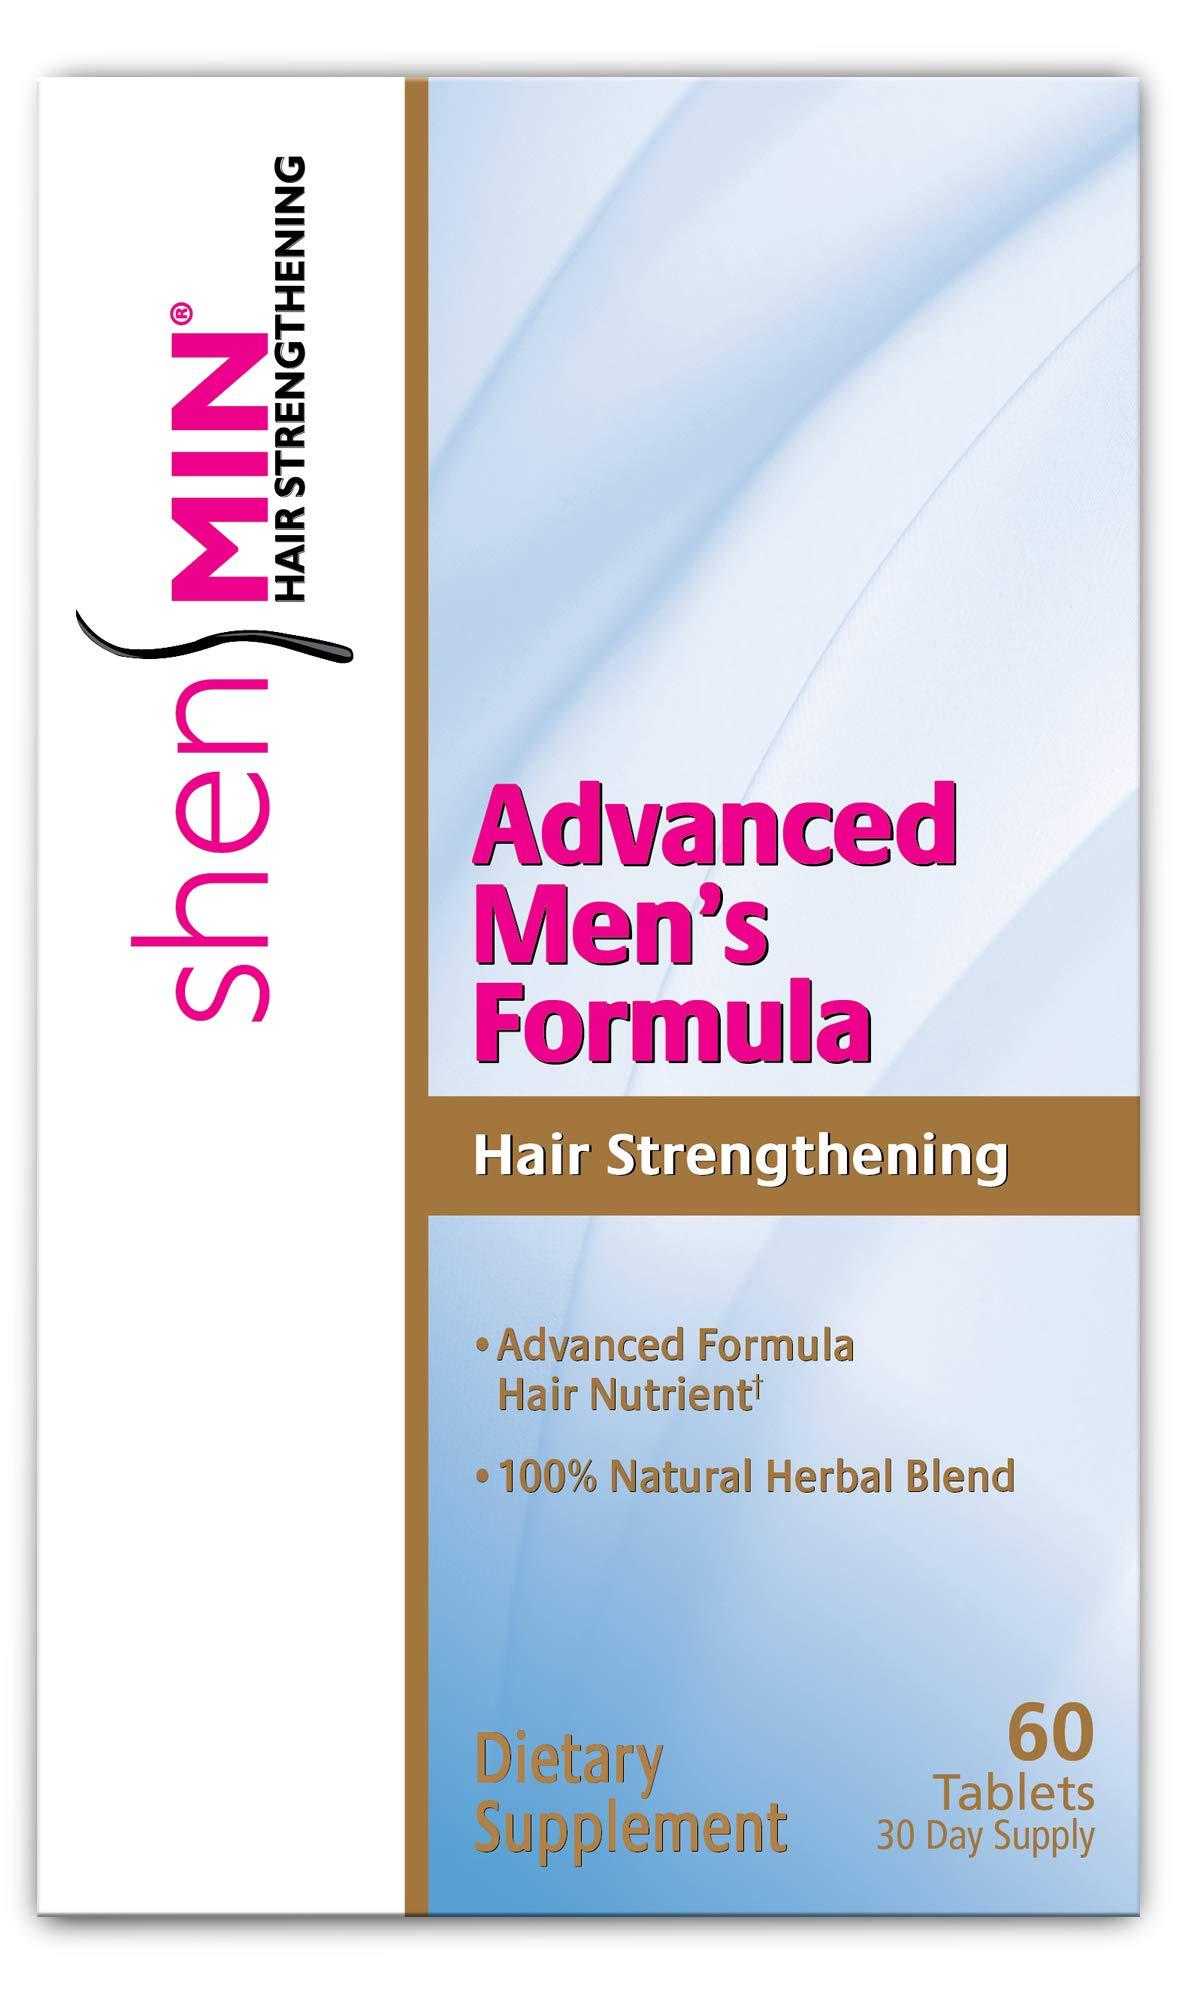 Shen Min Advanced Hair Strengthening Formula for Men, Tablets, Pink, 60 Count